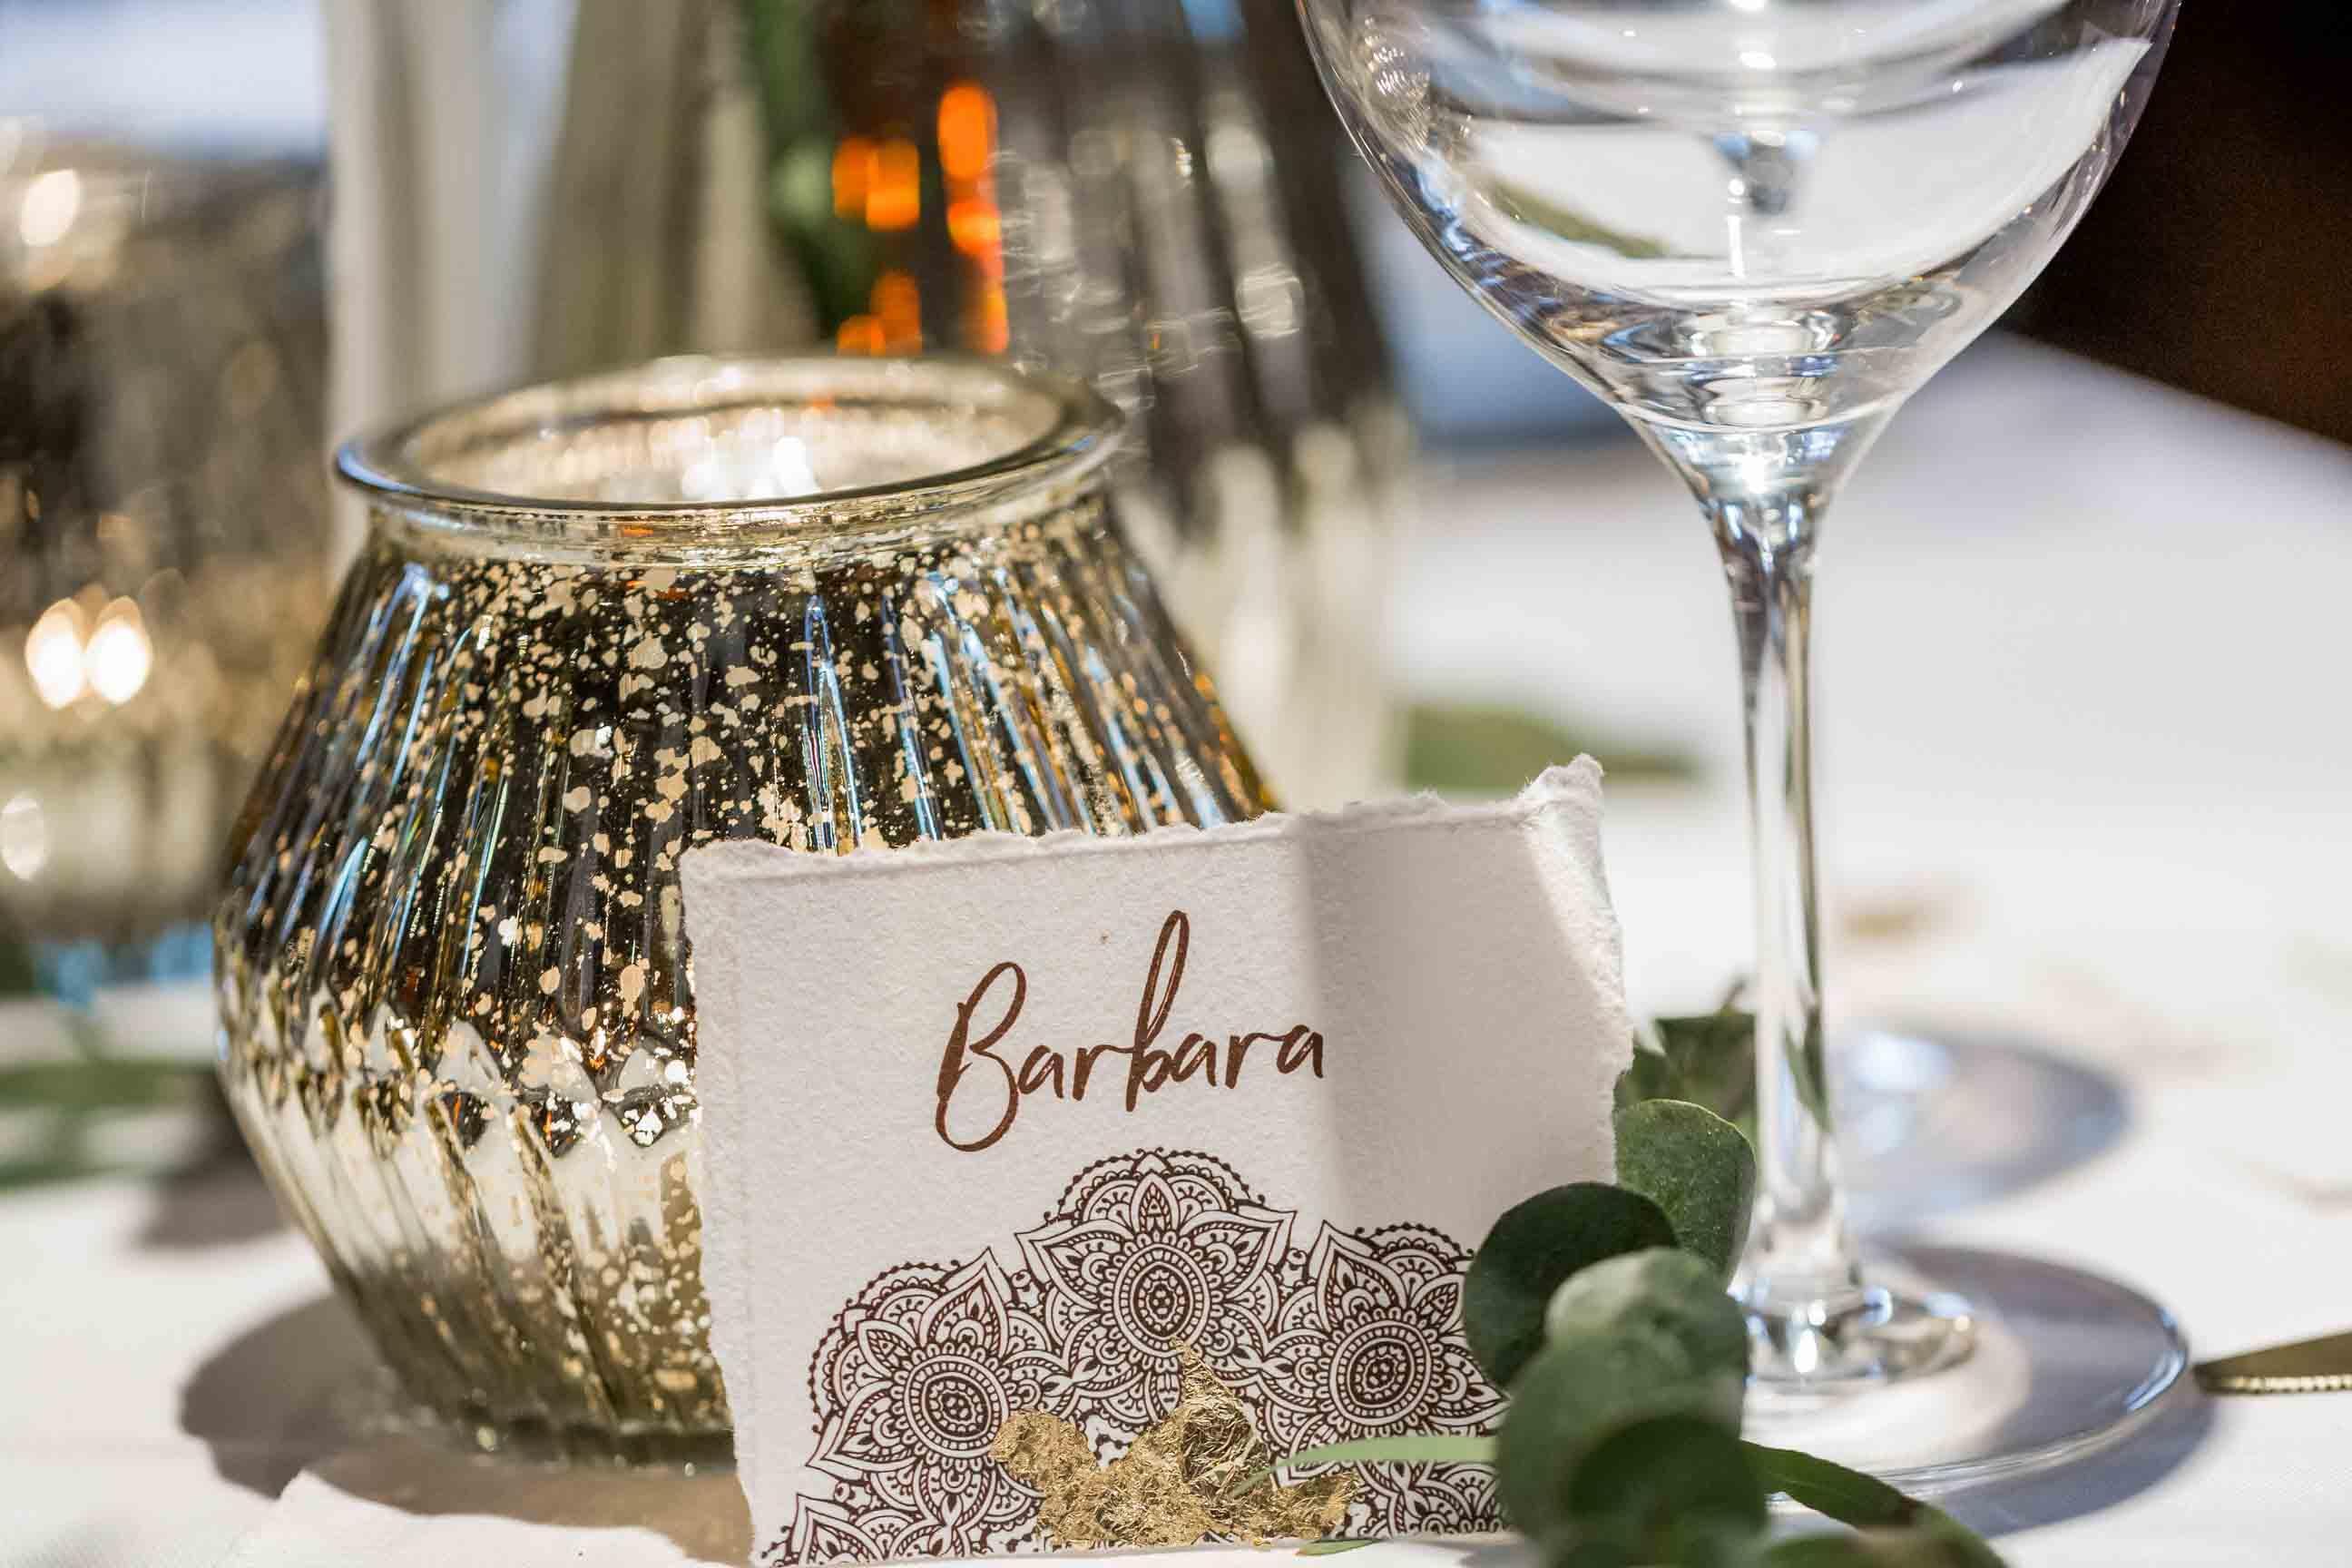 Boho Hochzeitskarten Bohemian Mandala Platzkarte Namenskarte Gold Winterhochzeit Hochzeitseinladung Tischdeko braun Blattgold rustikal Büttenpapier gerissener Rand